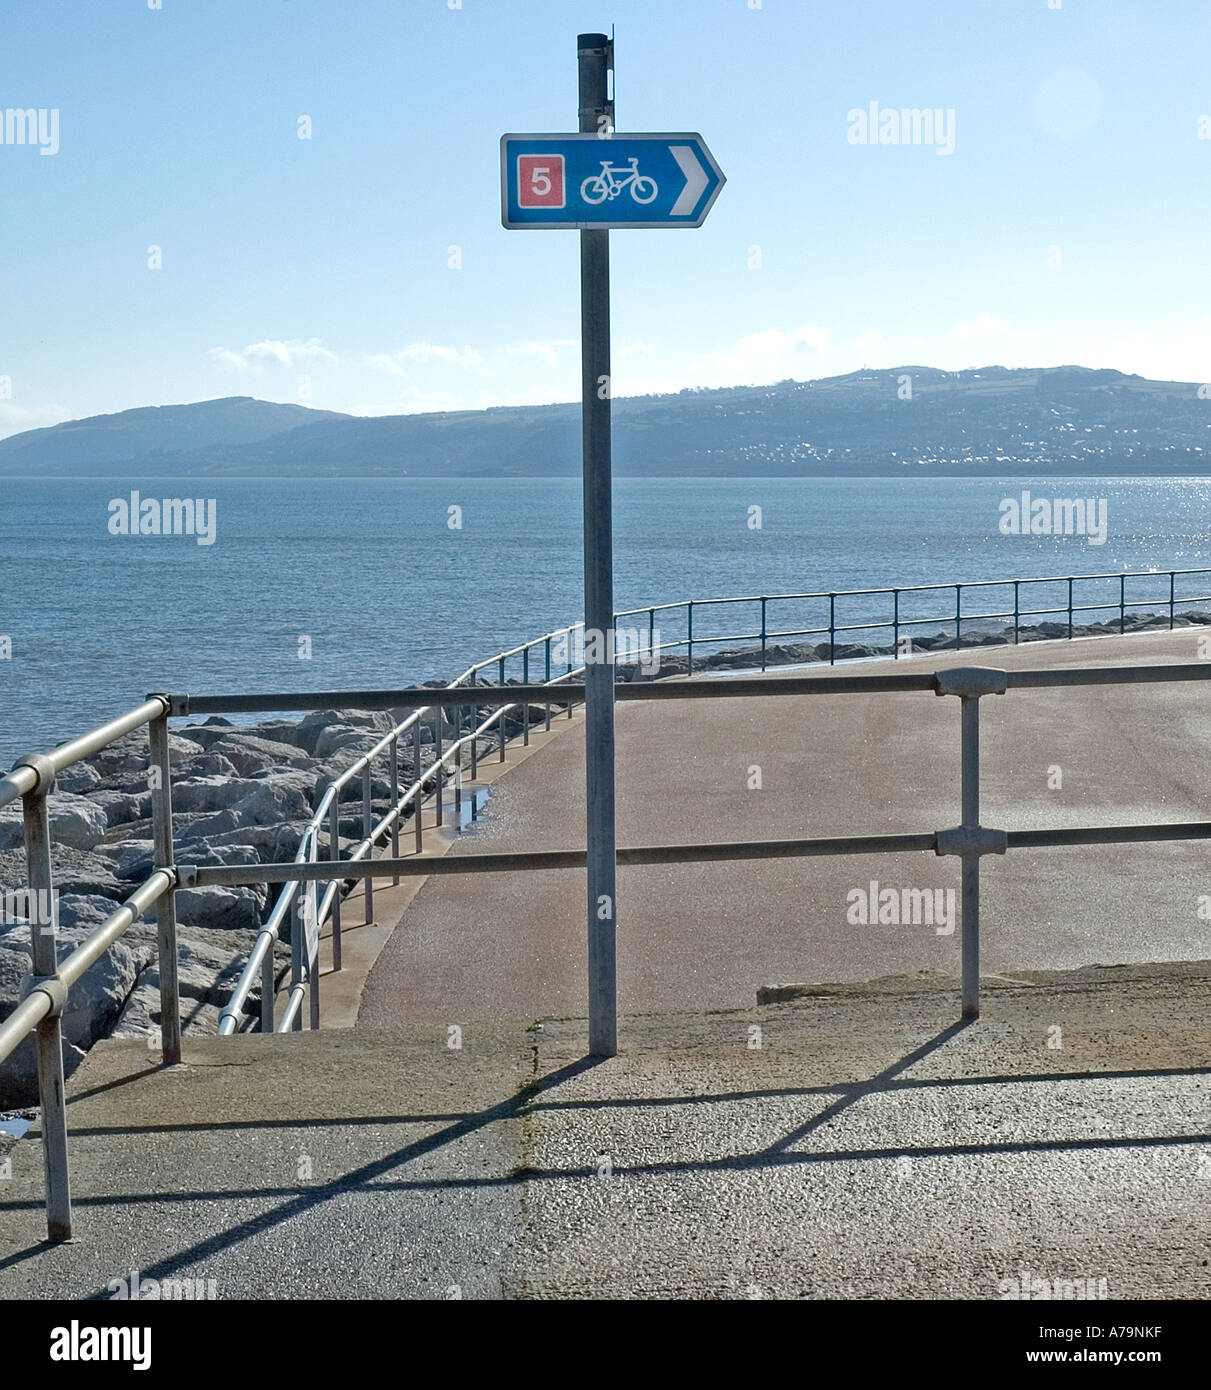 Cycle path sign,Colwyn Bay promenade - Stock Image